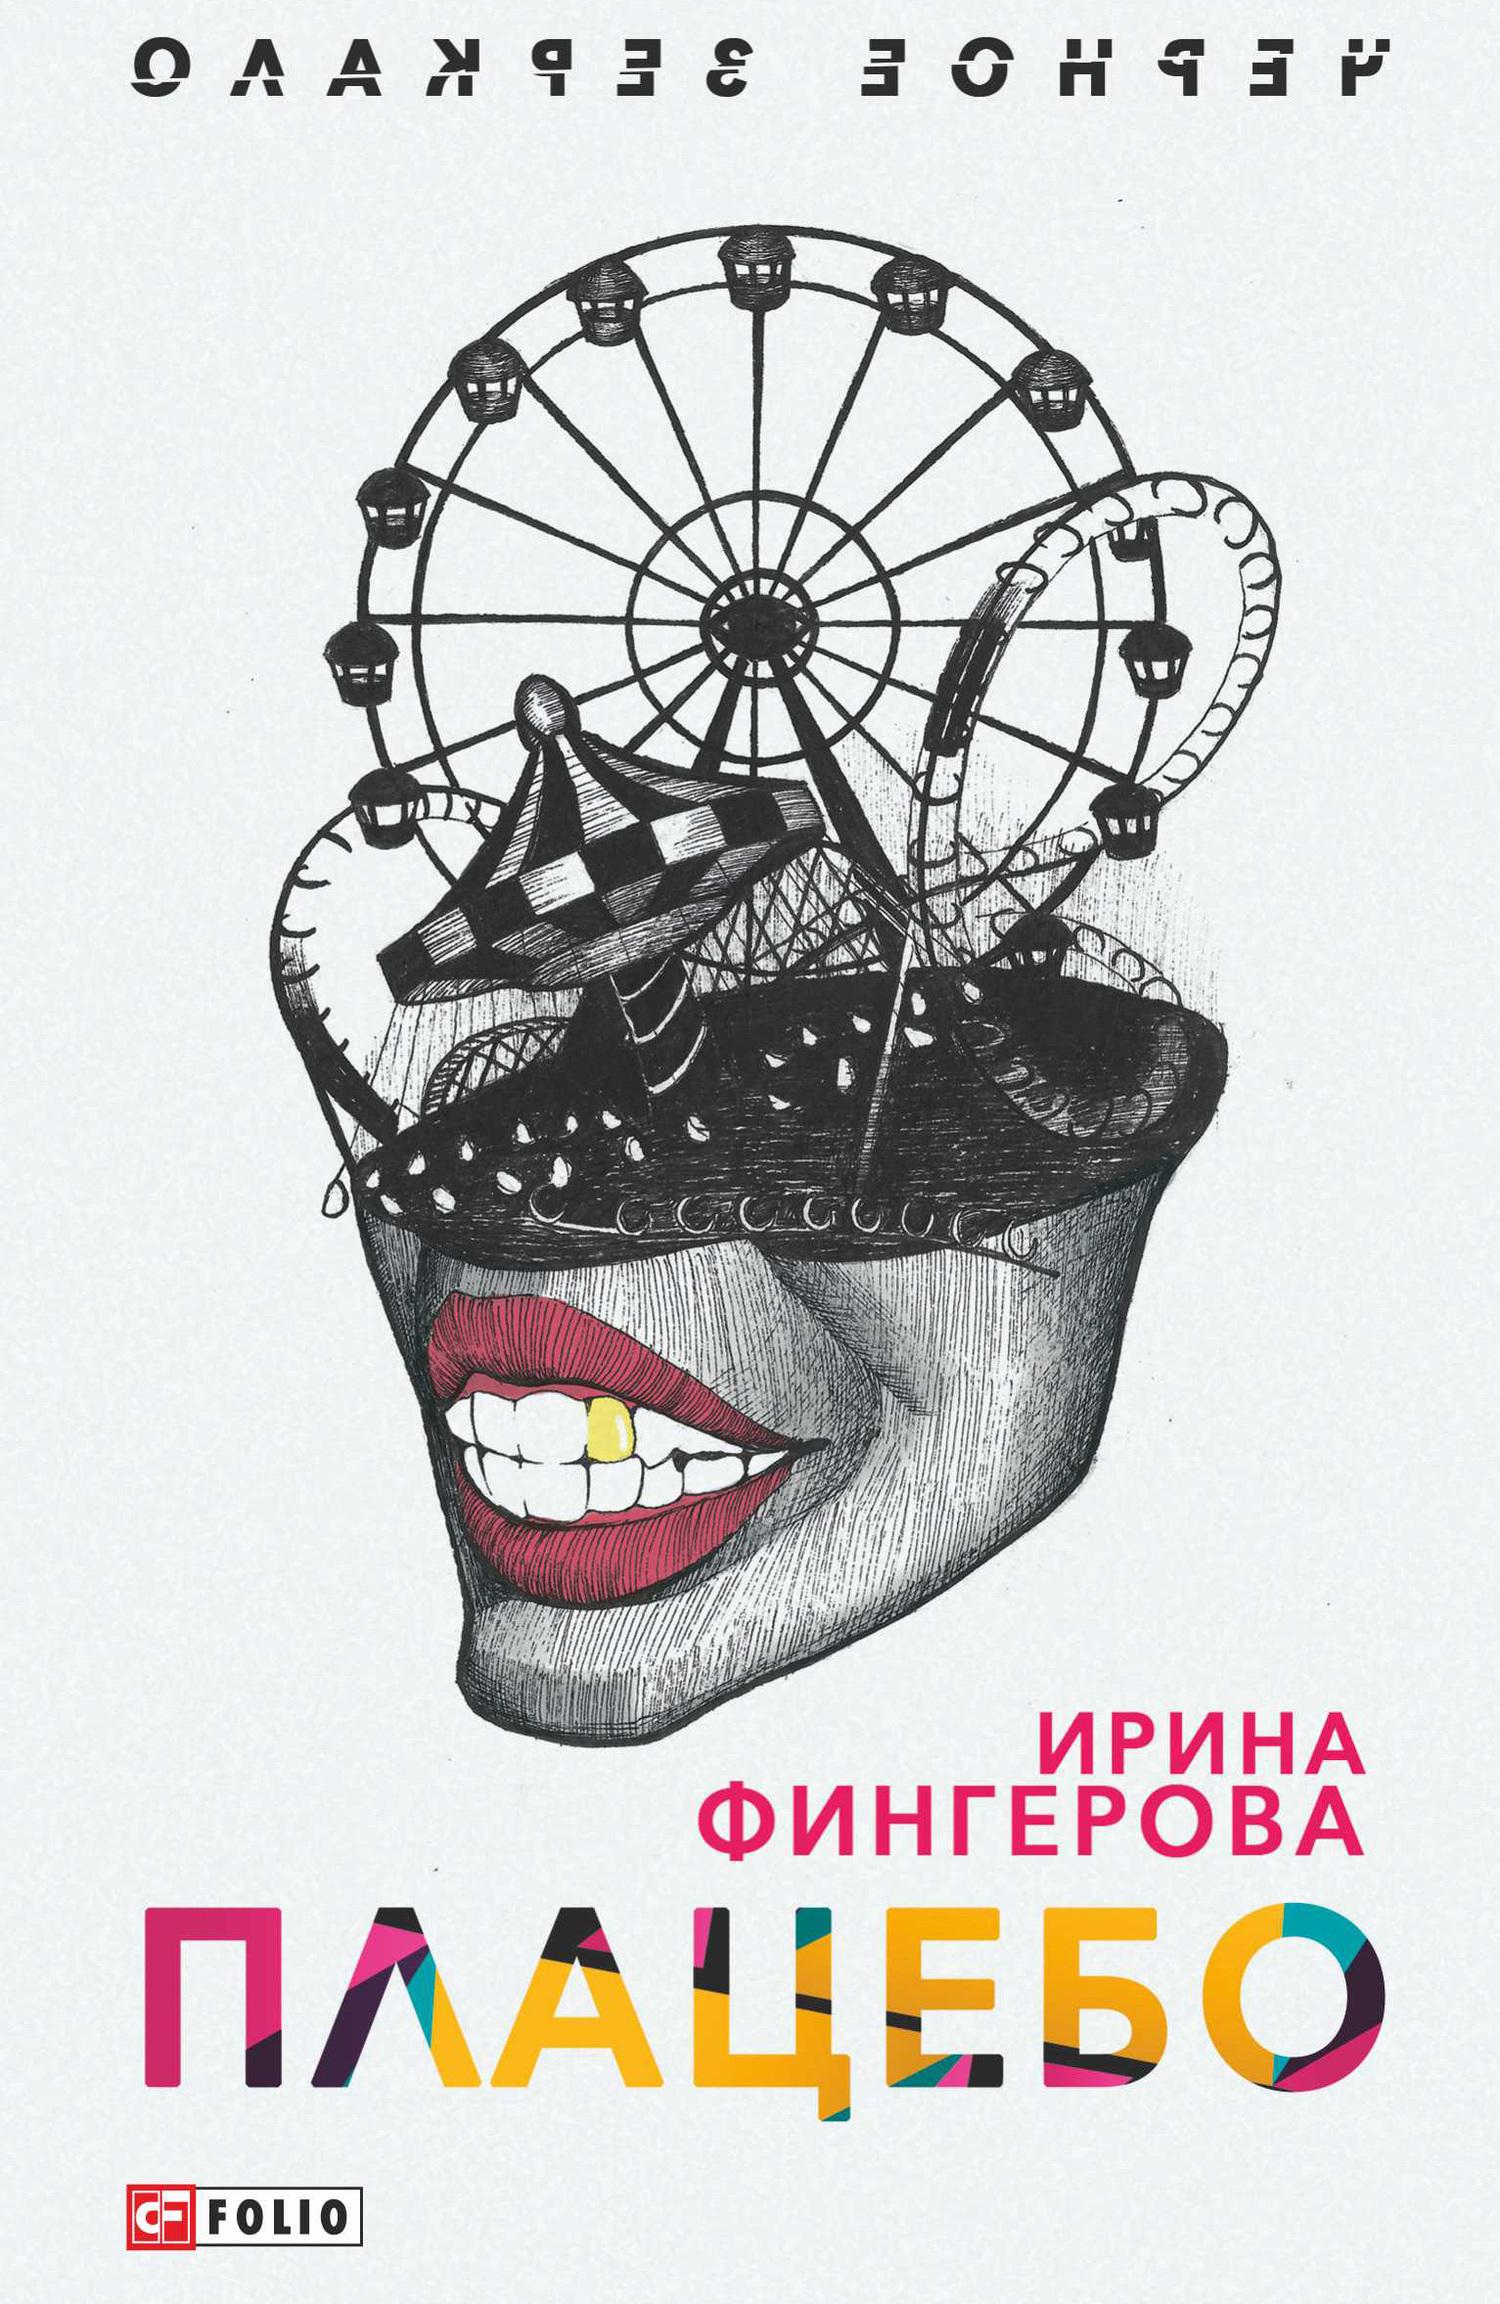 Ирина Фингерова - Плацебо